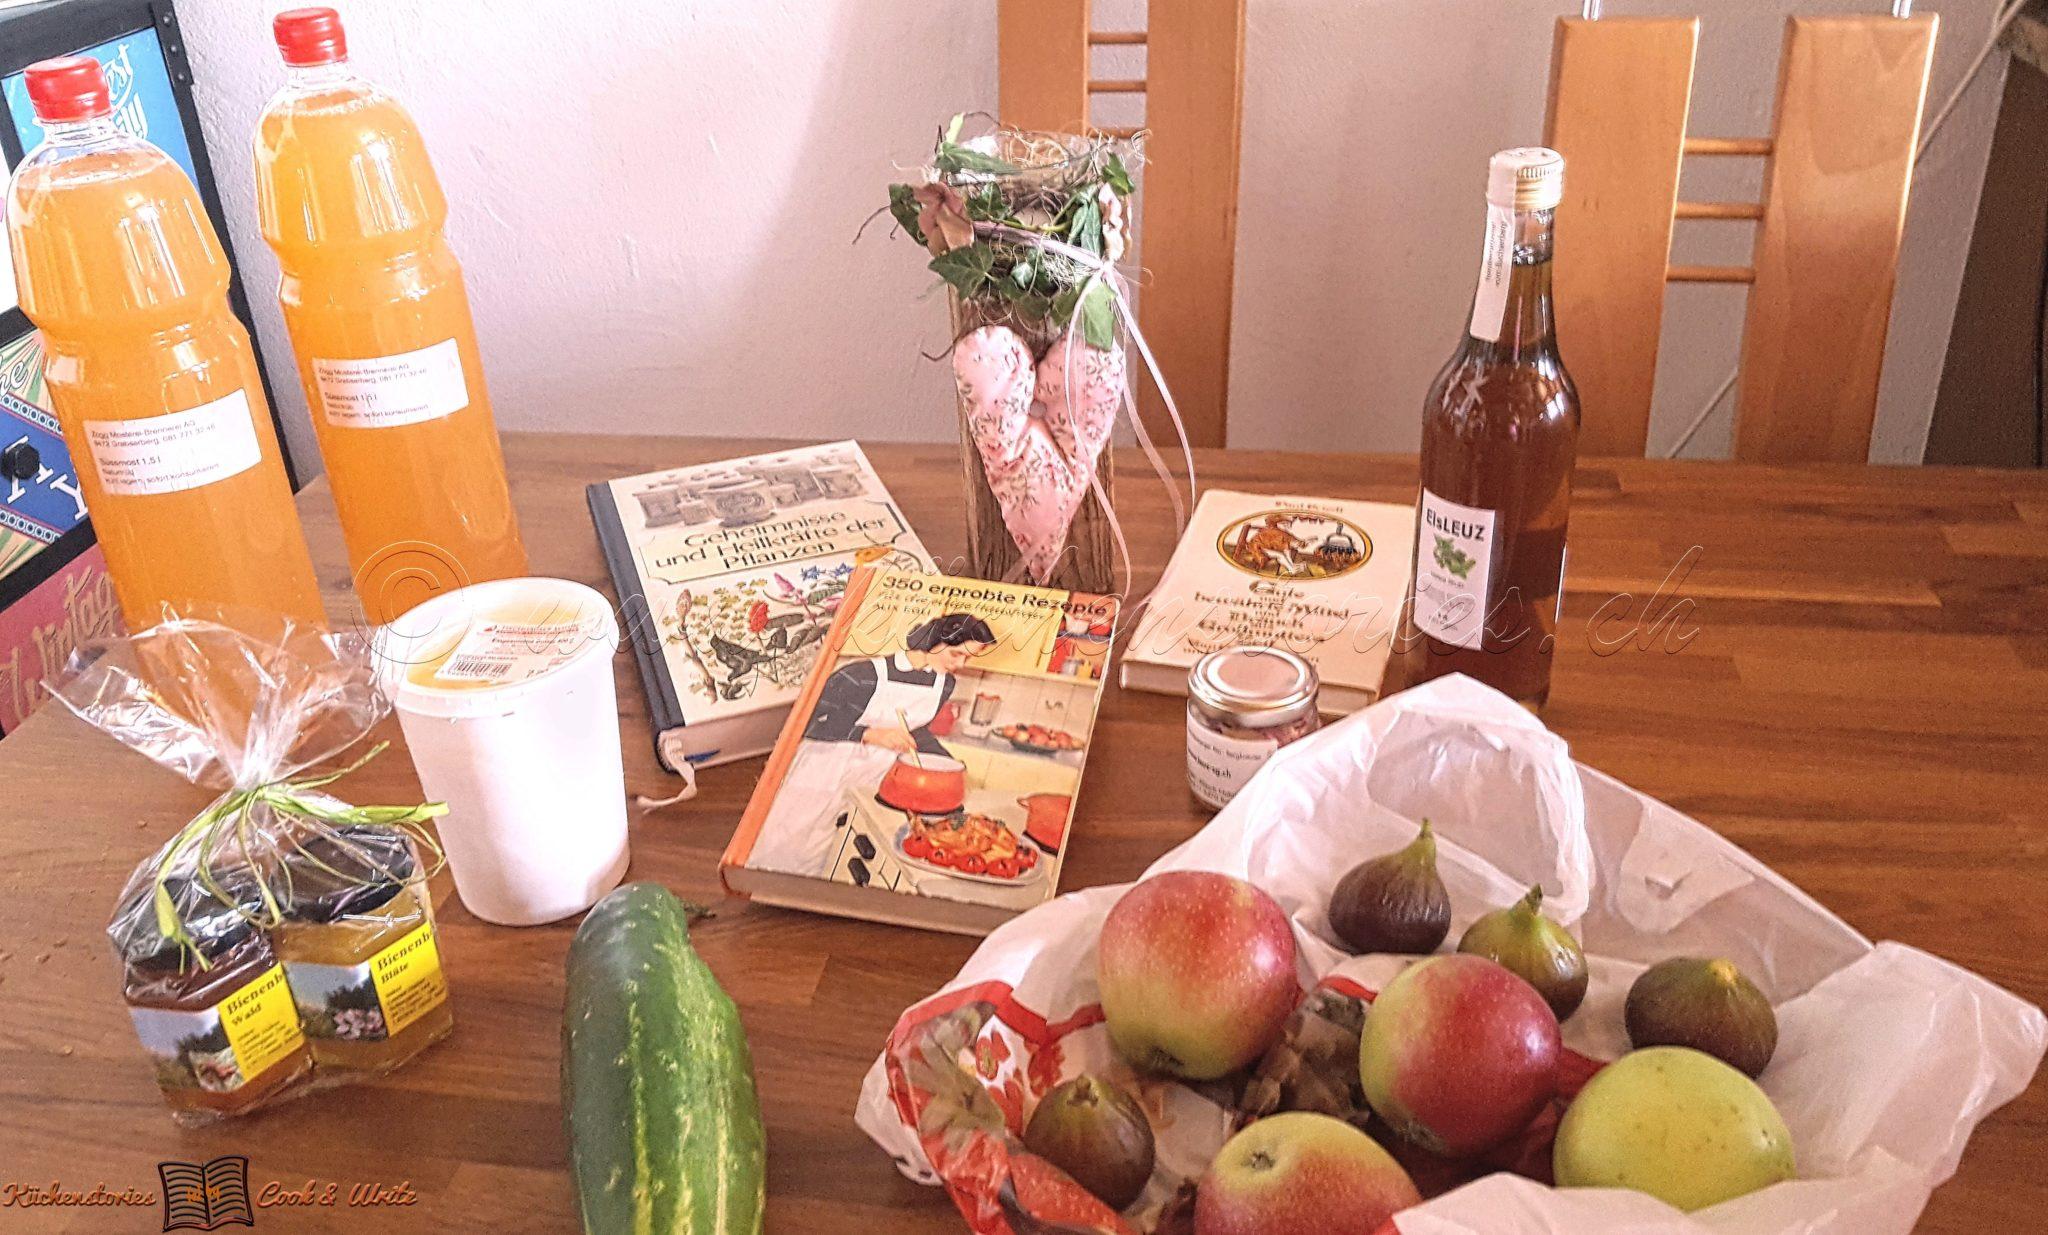 Bauernmarkt in Grabs